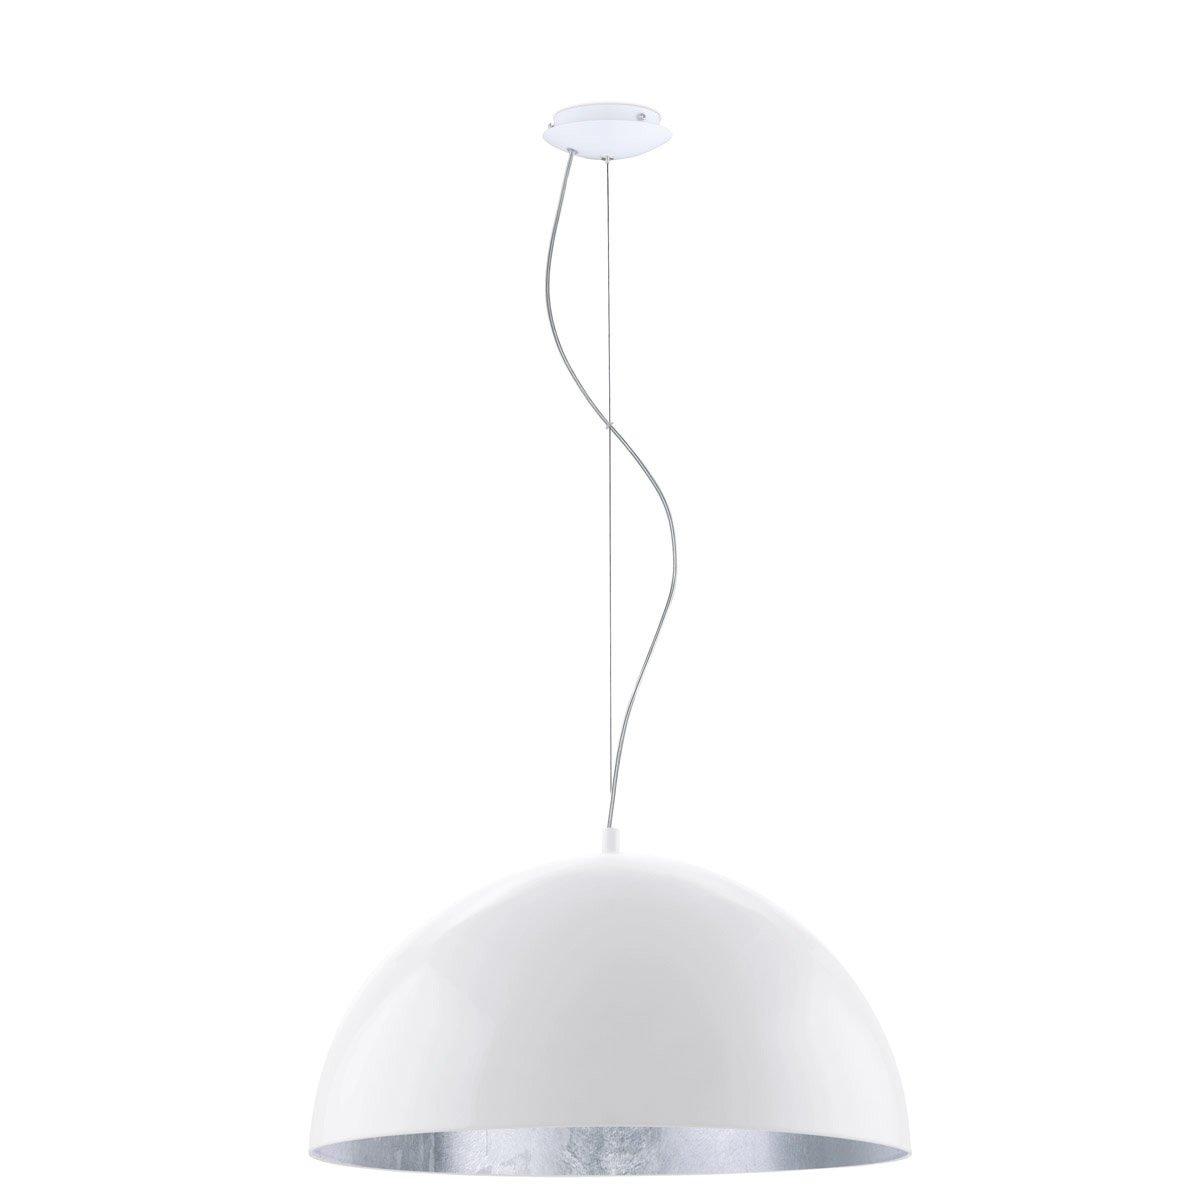 Eglo Hanglamp Gaetano 1 wit - zilver Eglo 94941